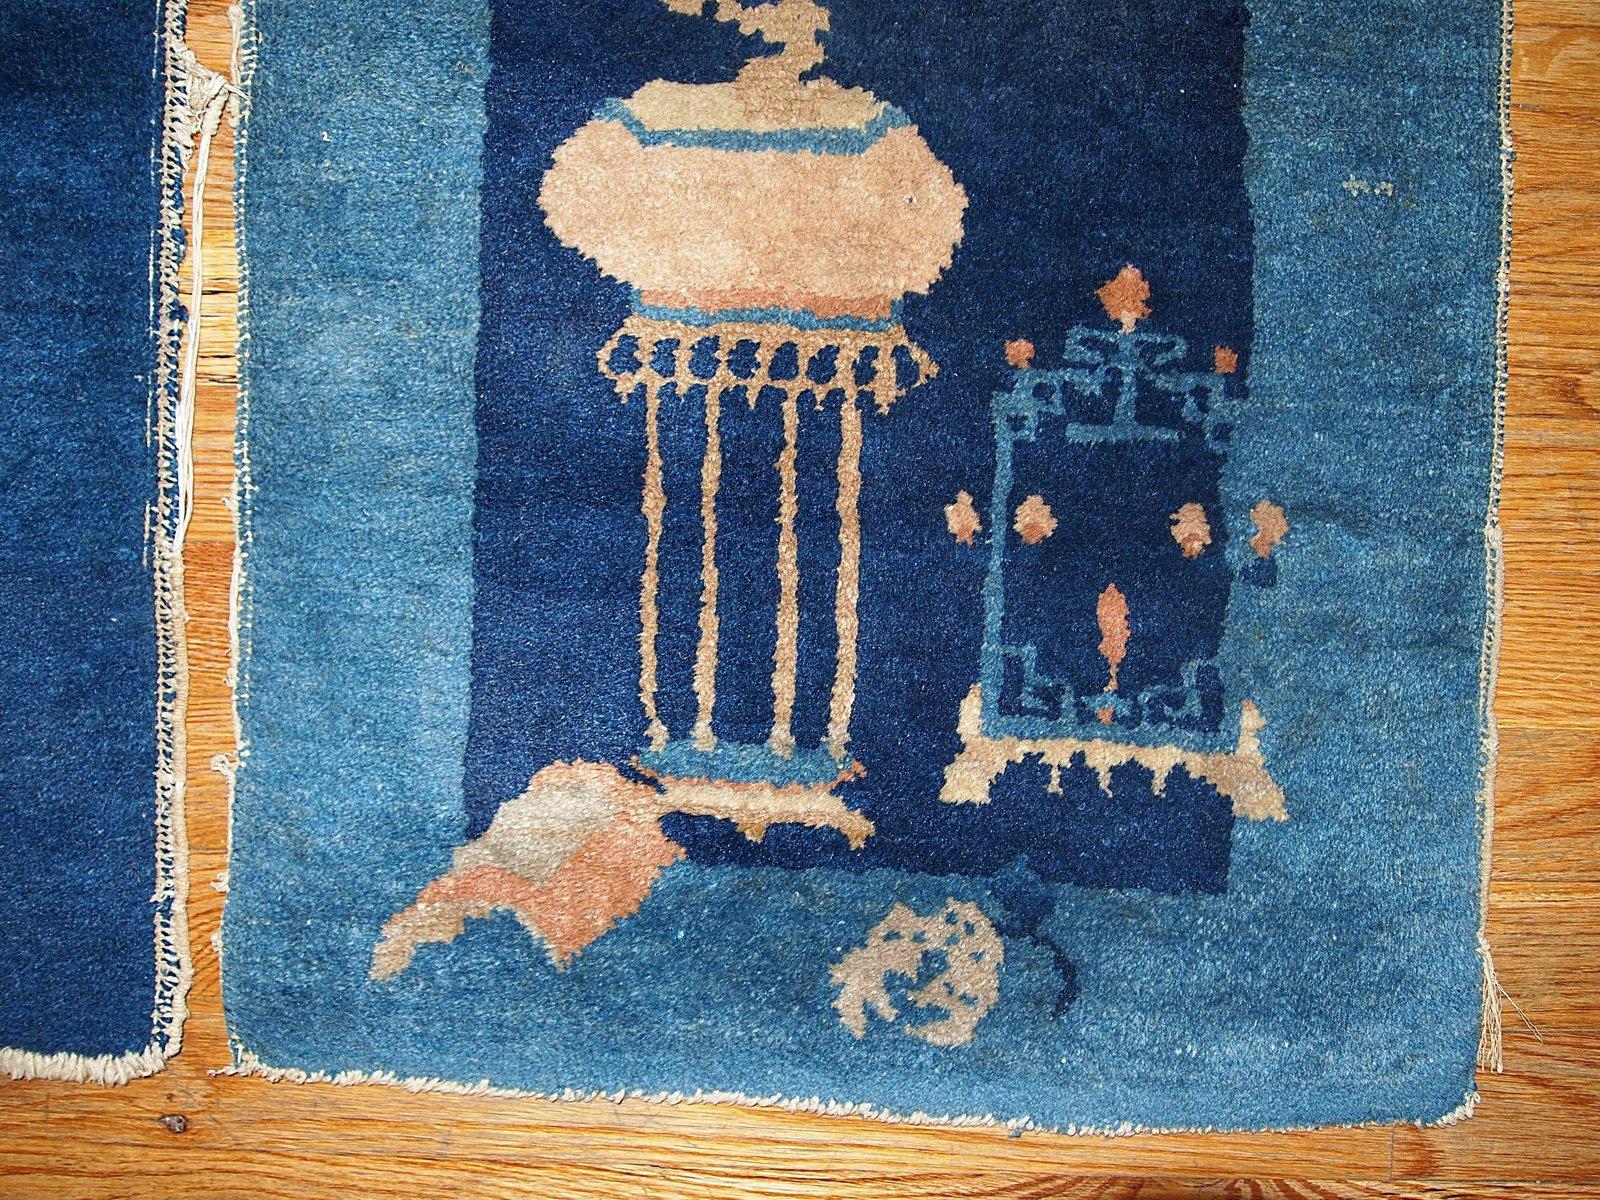 alfombras peking chinas antiguas hechas a mano d cada de